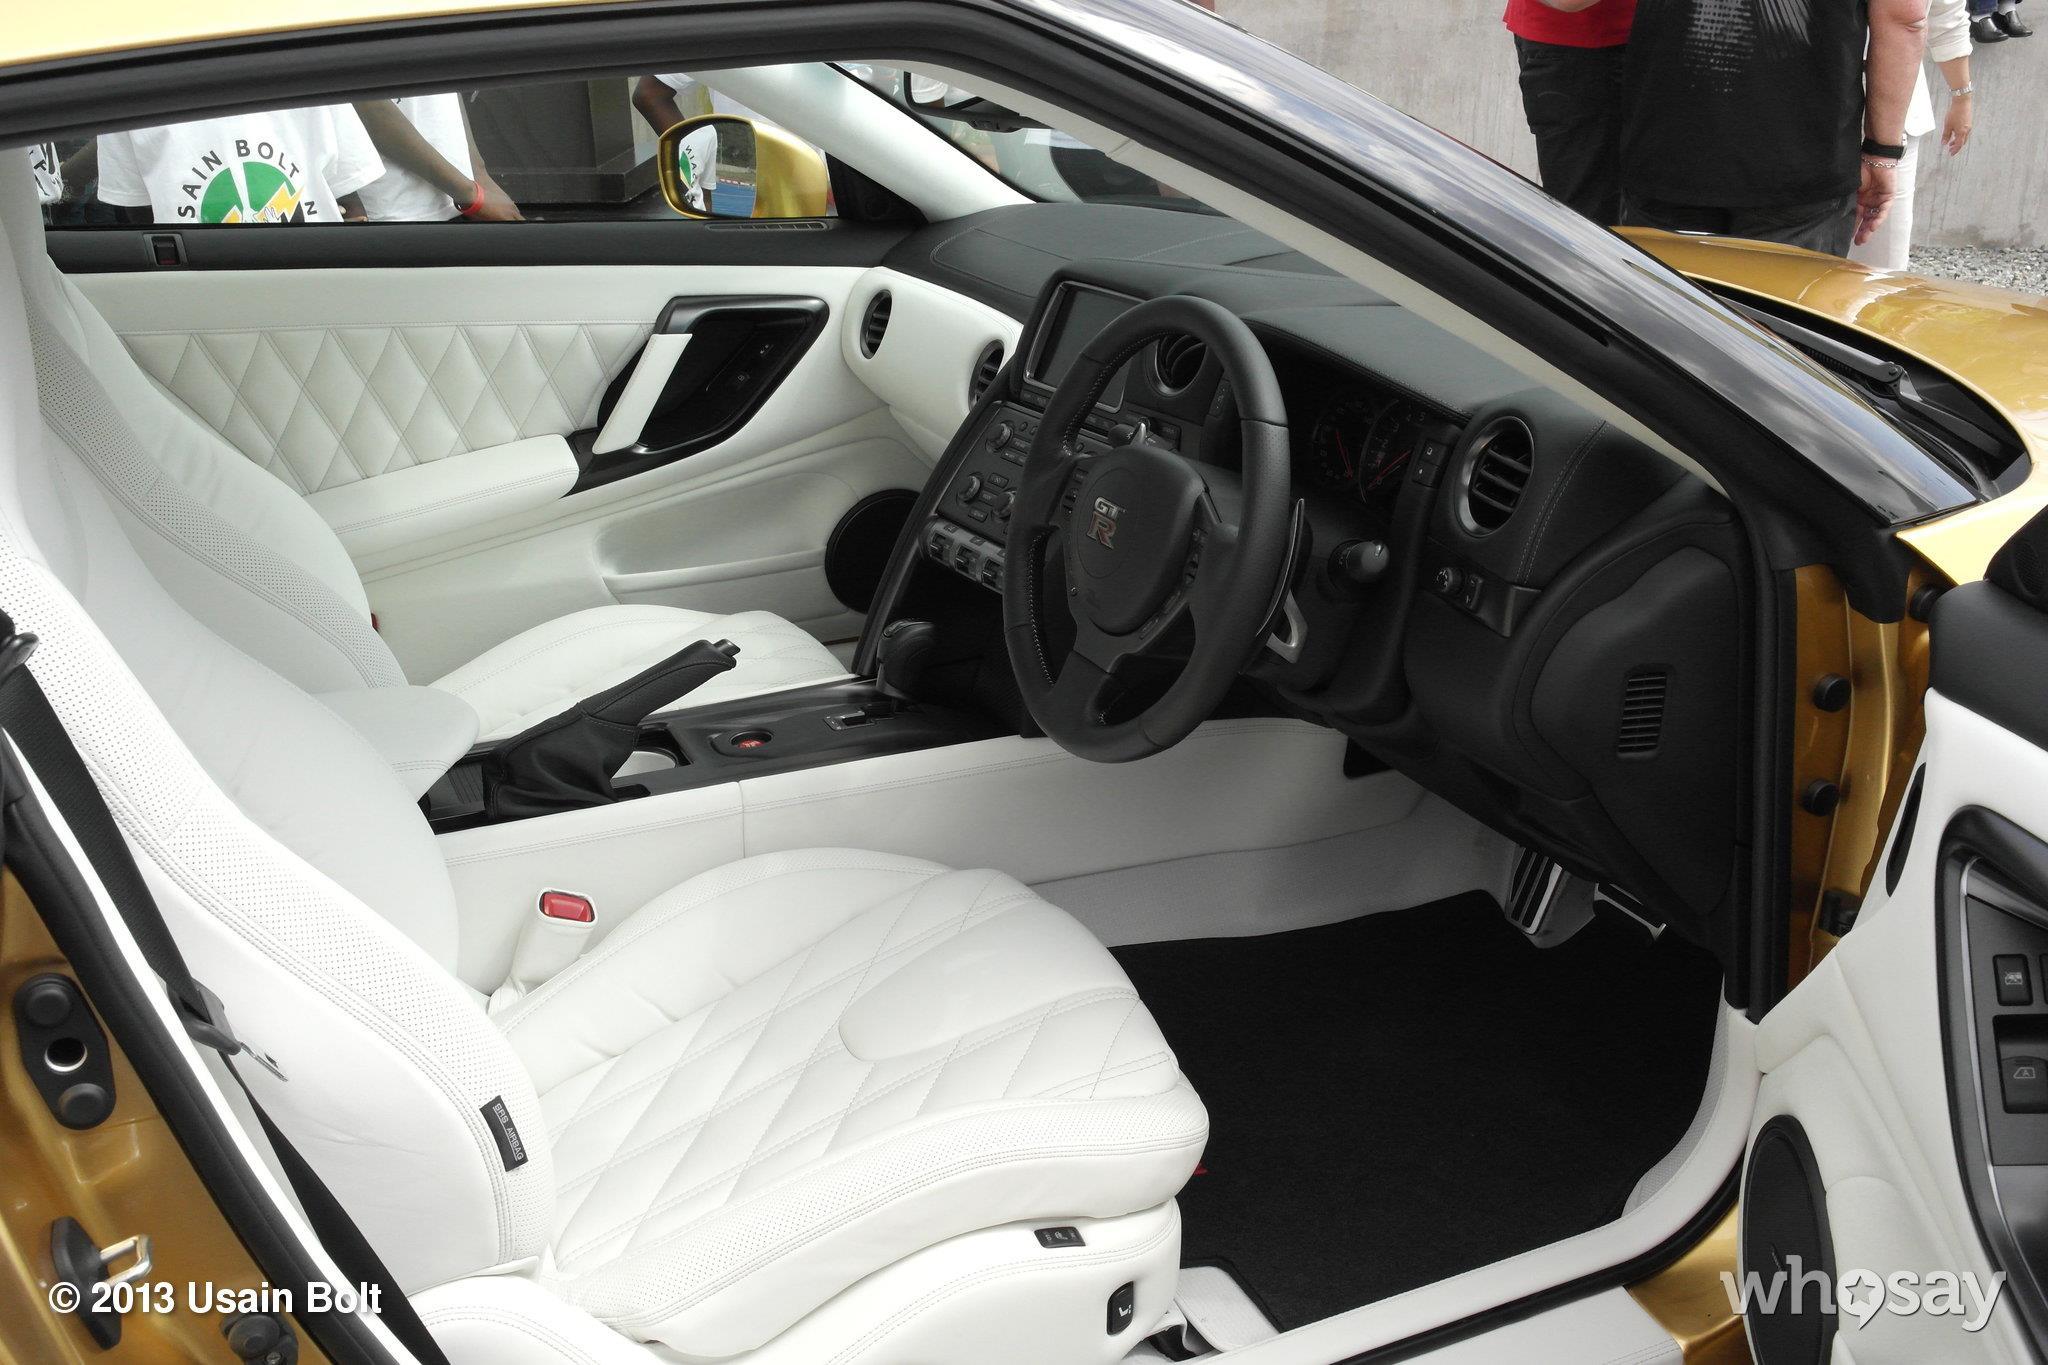 Usain Bolt nissan gt-r white interior